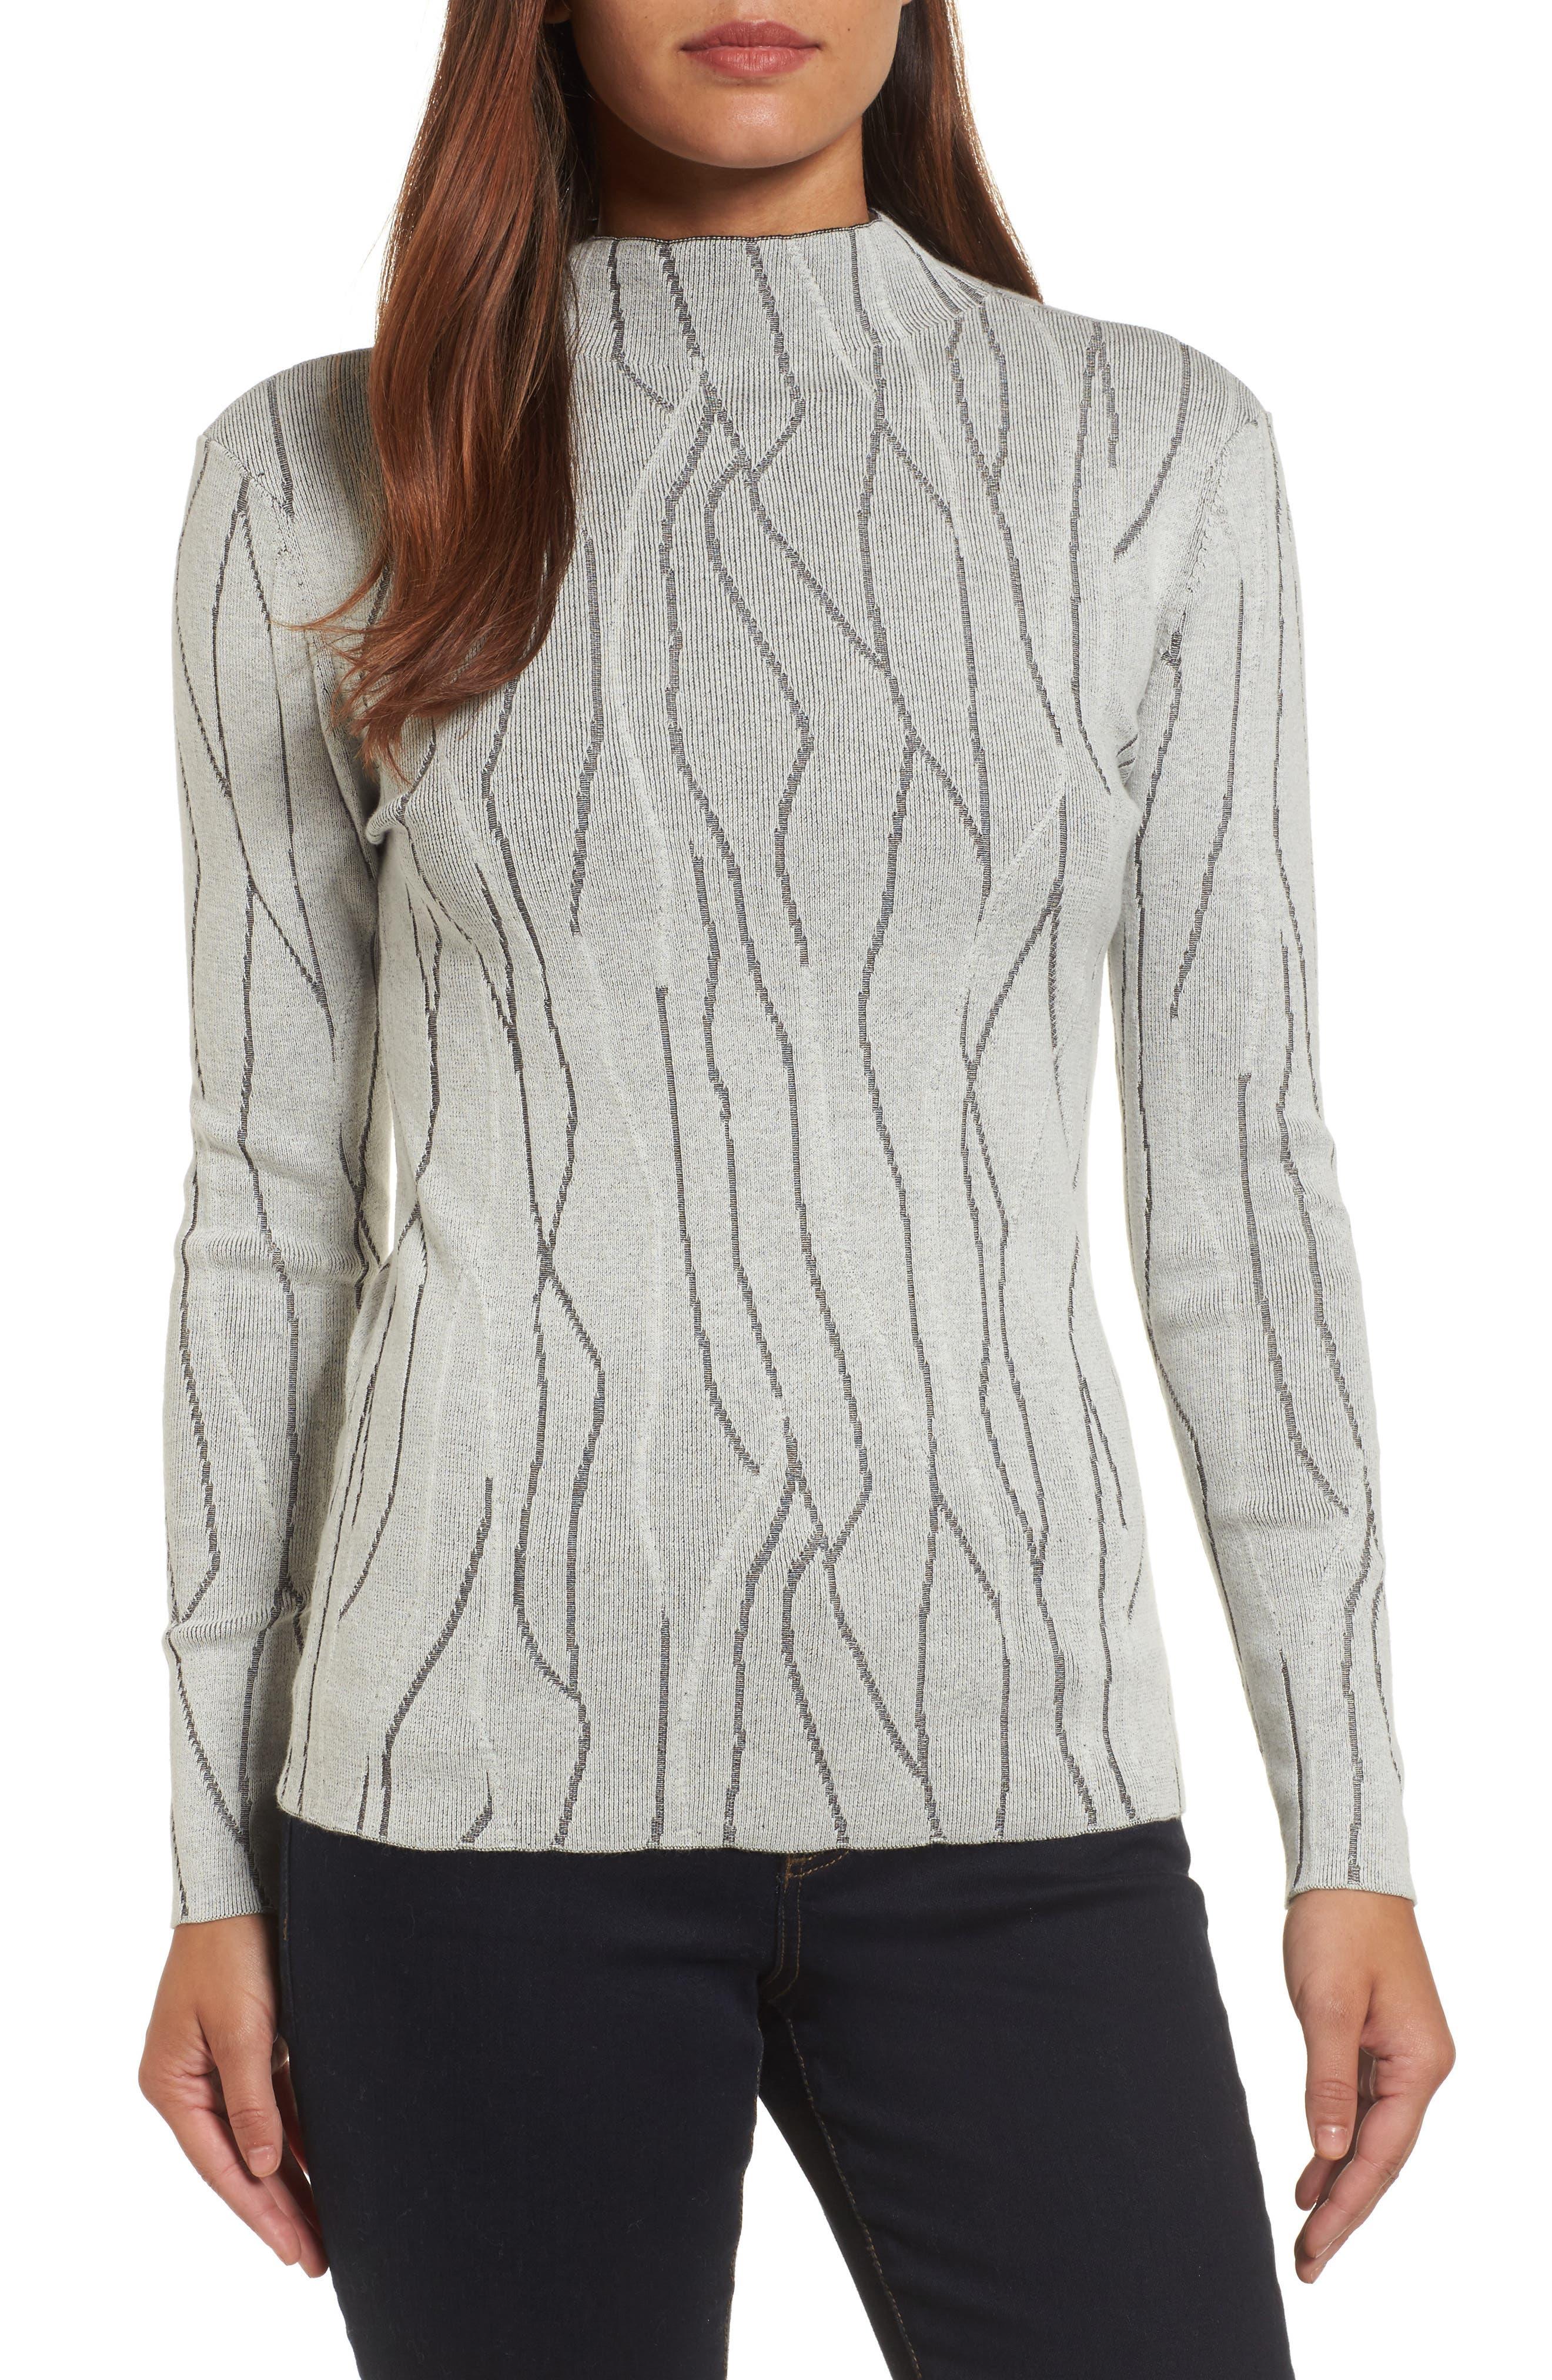 Main Image - NIC+ZOE Artisanal Crackle Jacquard Sweater (Regular & Petite)